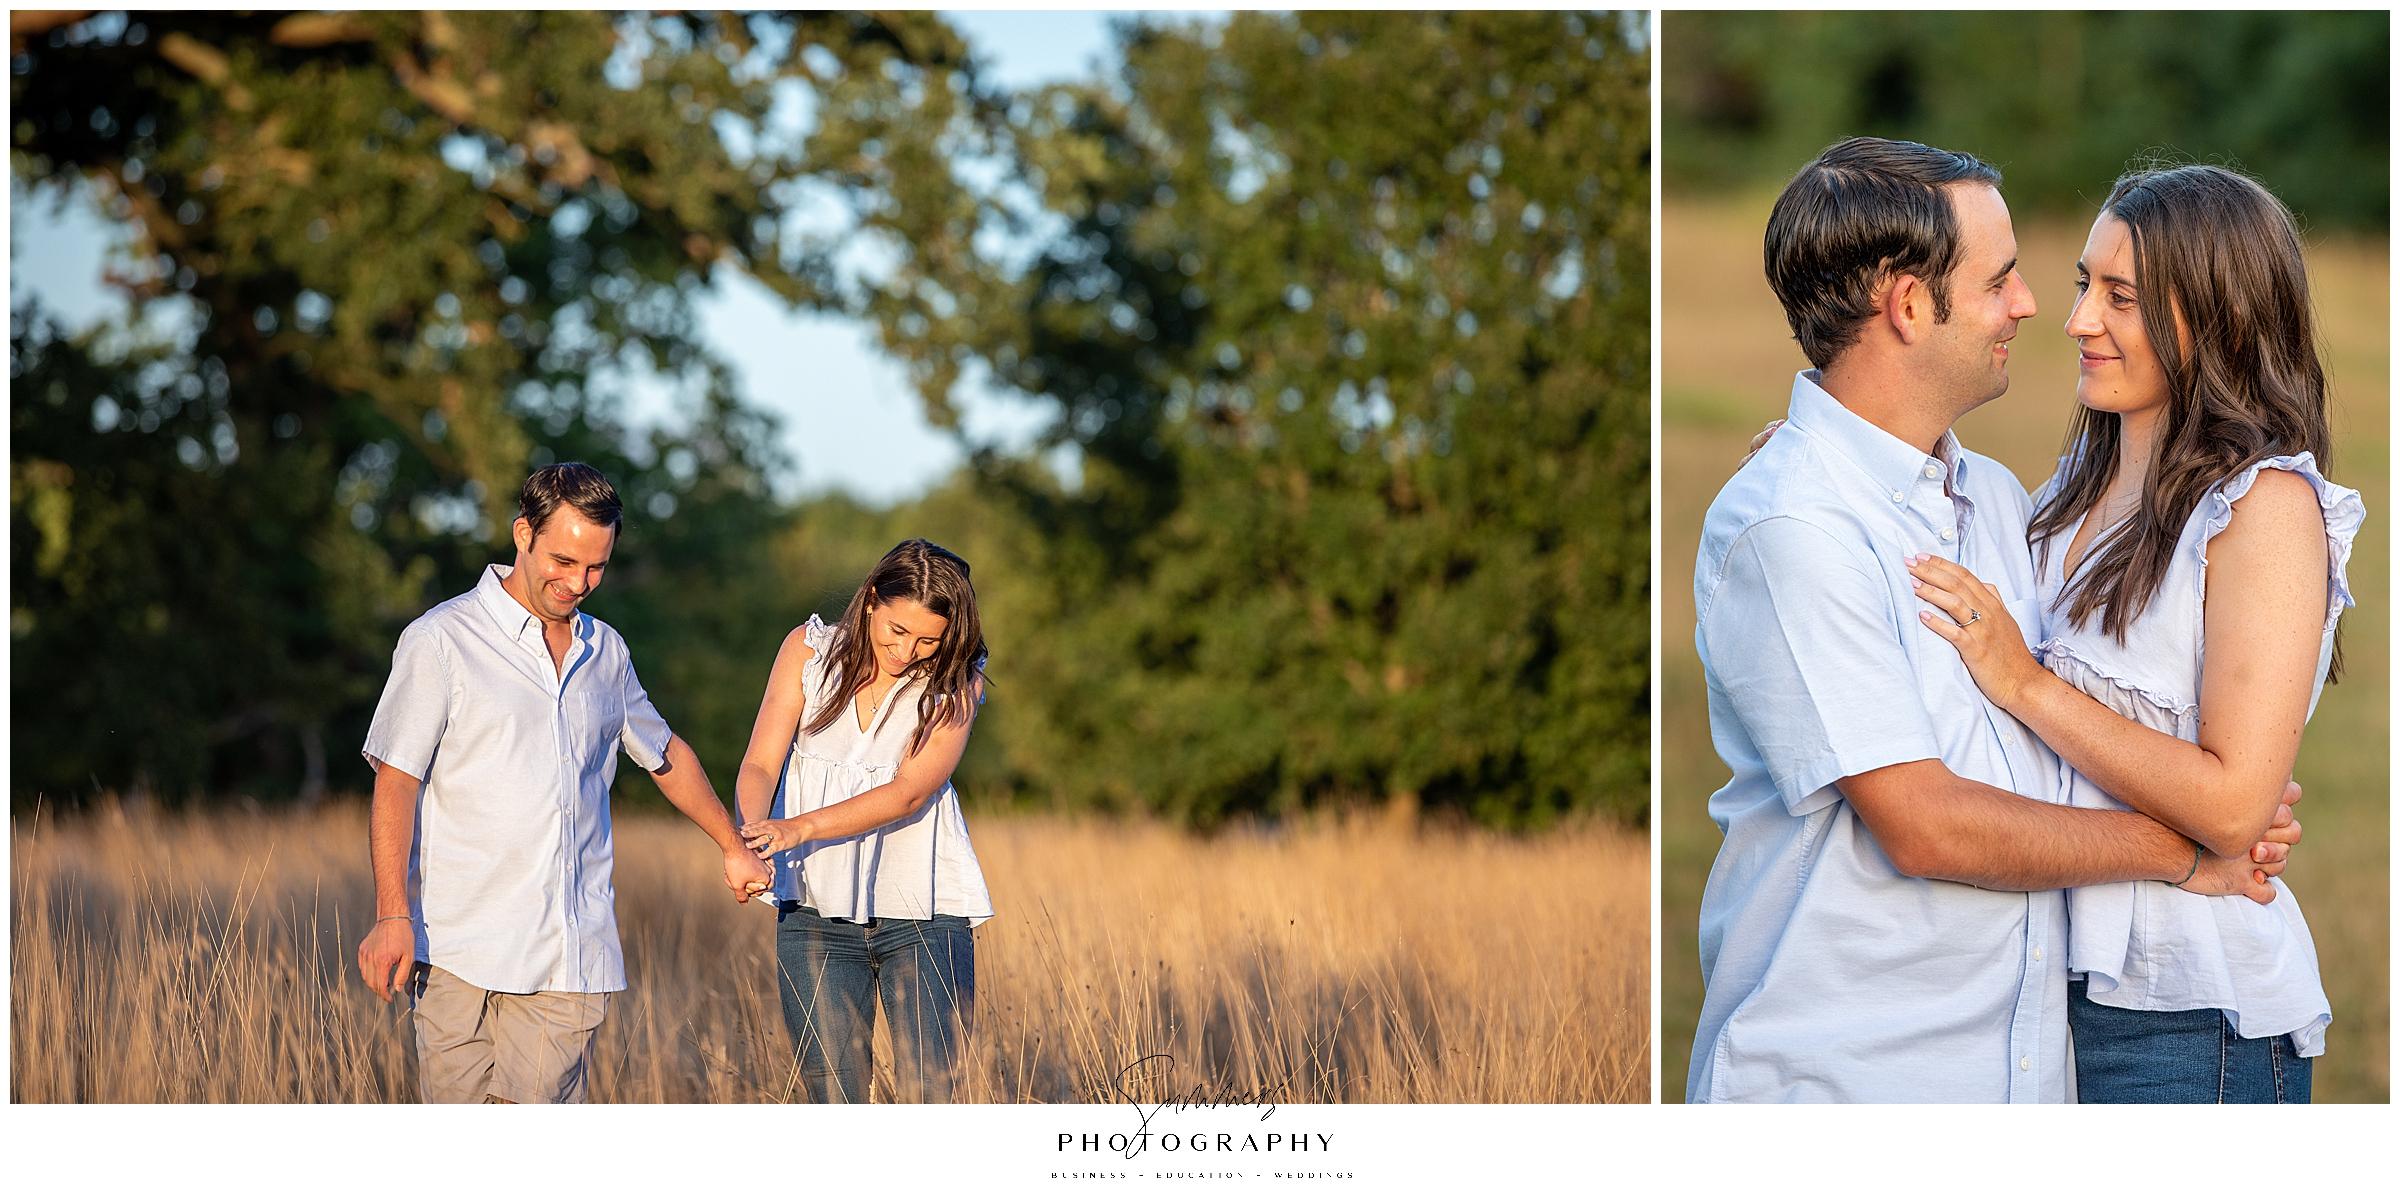 Berkshire wedding photographer Cantley House Hotel Engagement